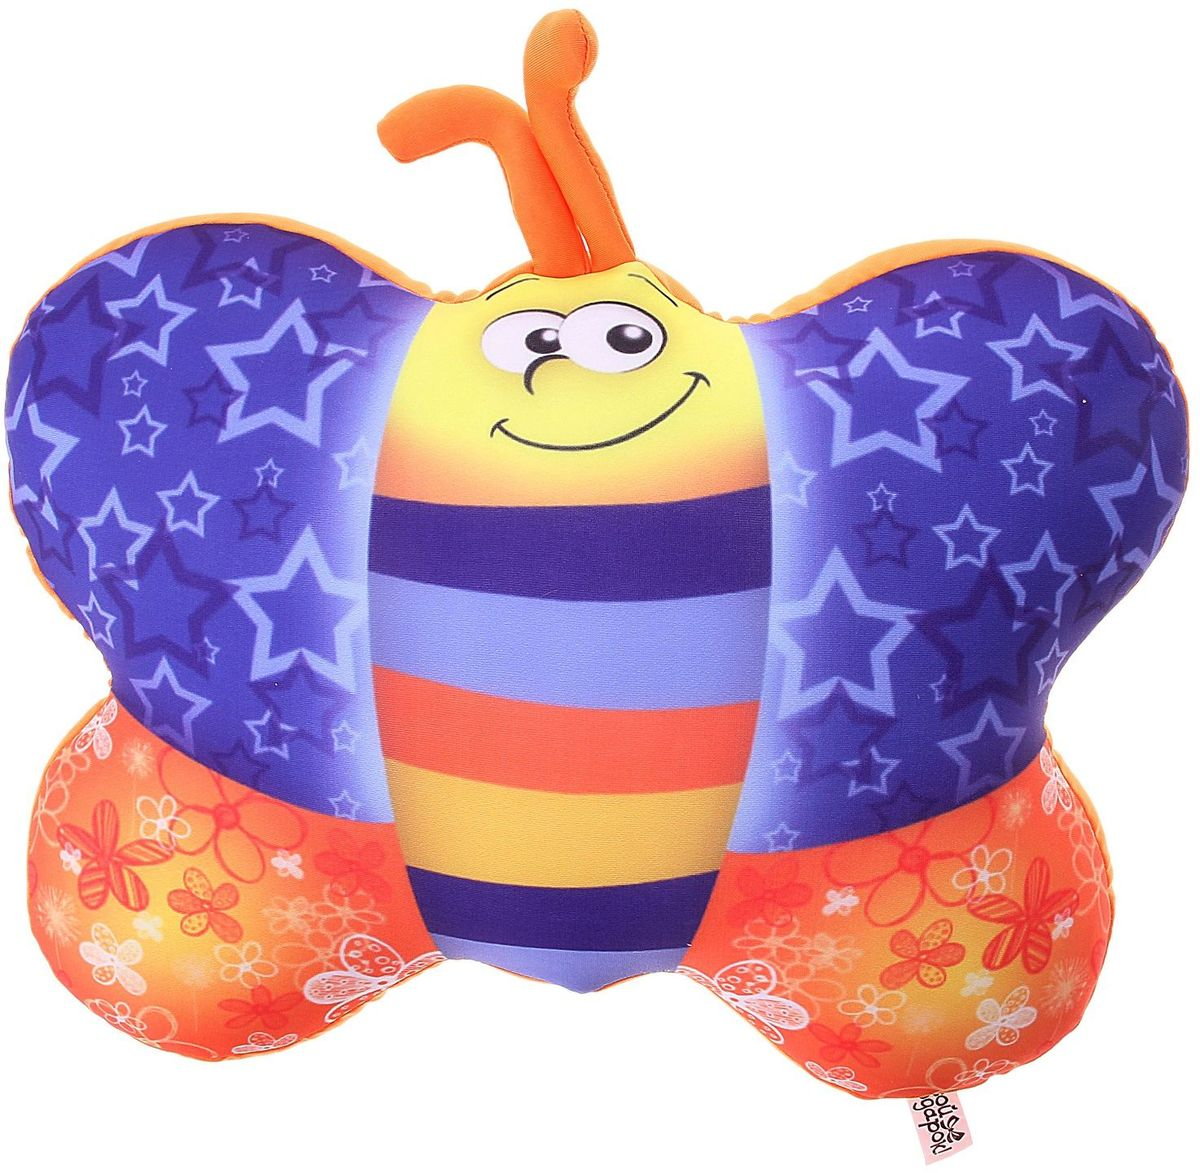 Sima-land Мягкая игрушка-антистресс Бабочка 330463 мягкая игрушка sima land овечка на присосках 18 см 332770